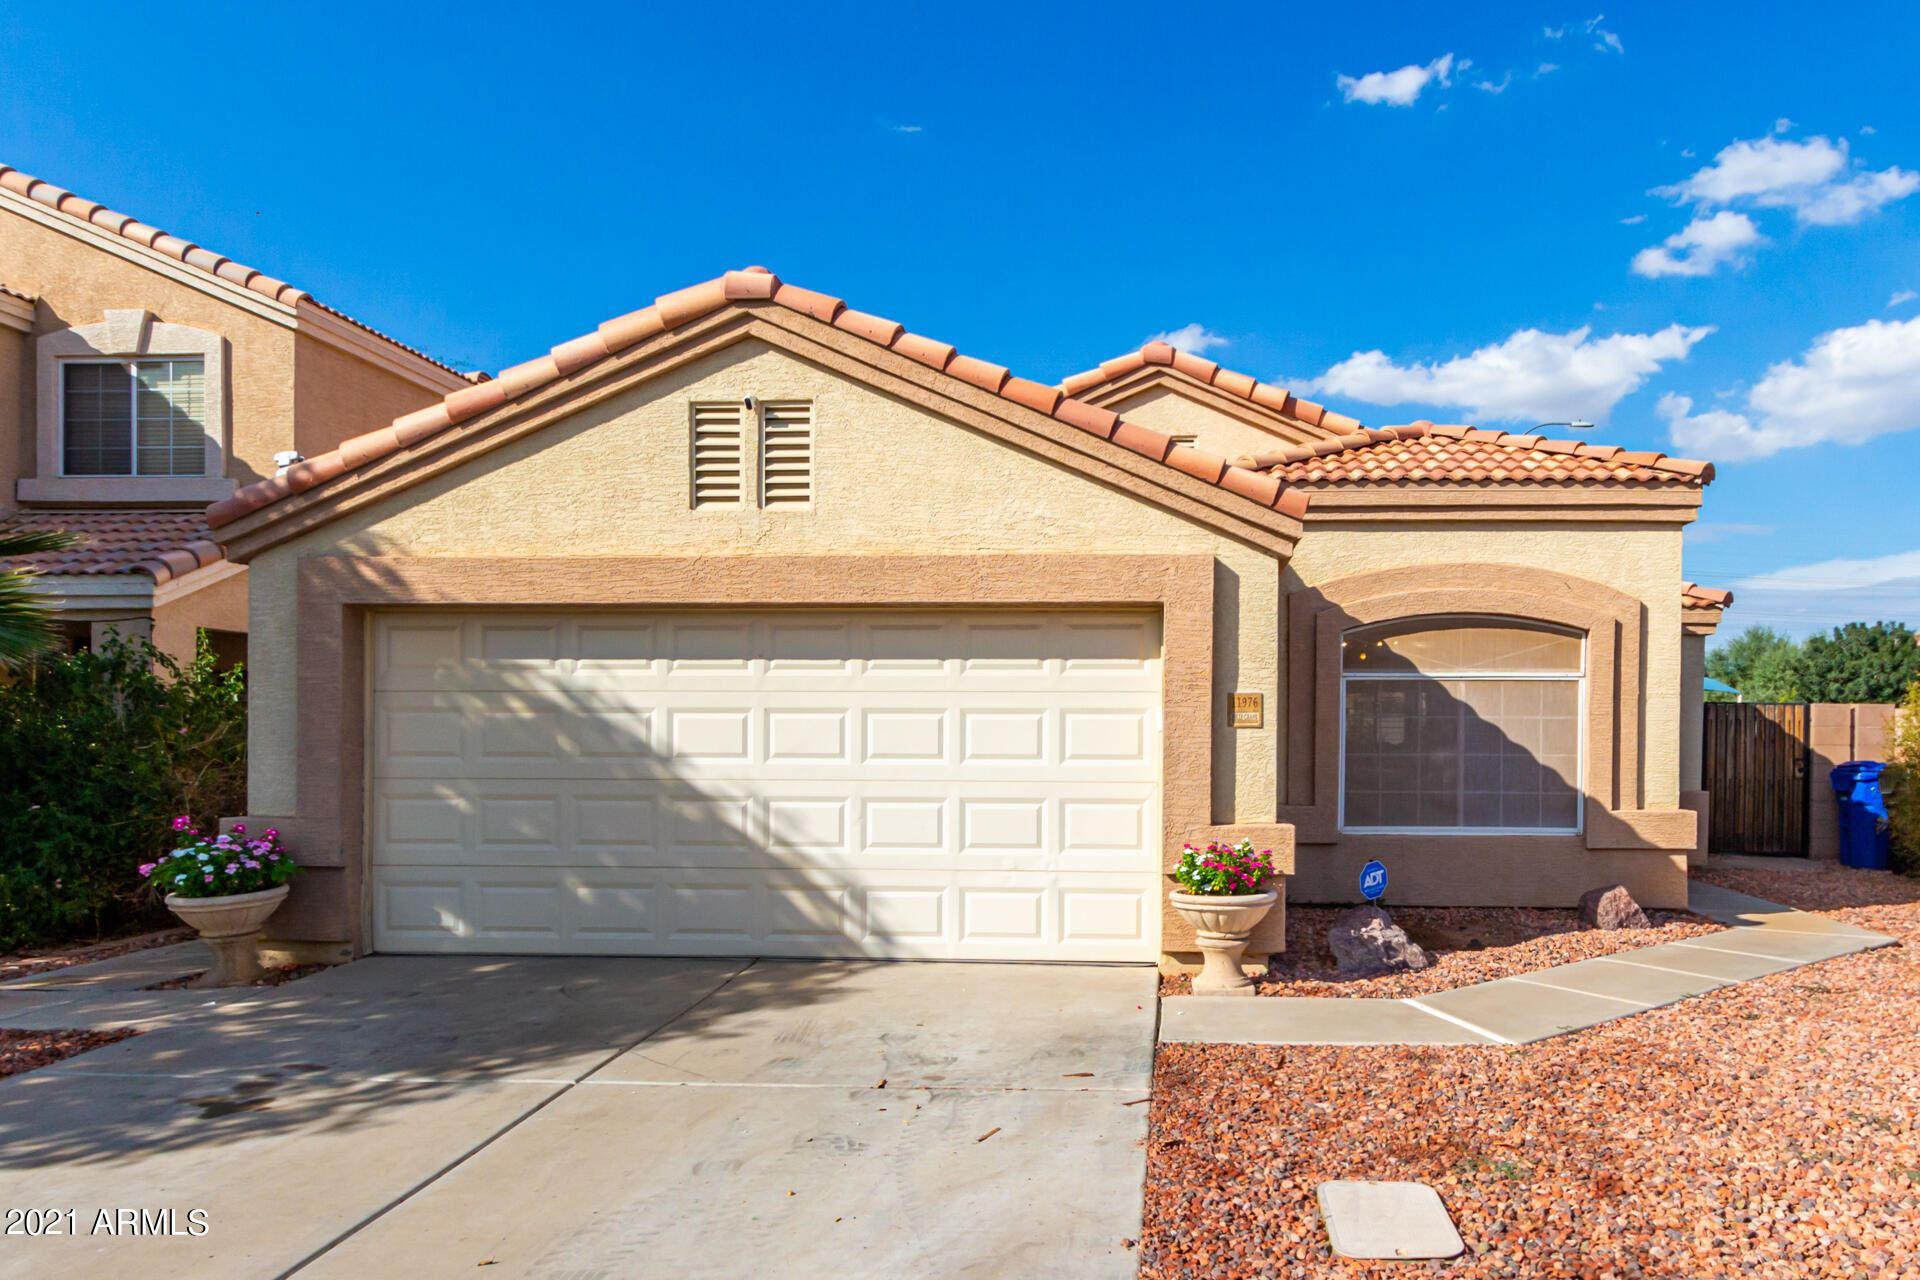 Photo of 11976 W ALMERIA Road, Avondale, AZ 85392 (MLS # 6304878)